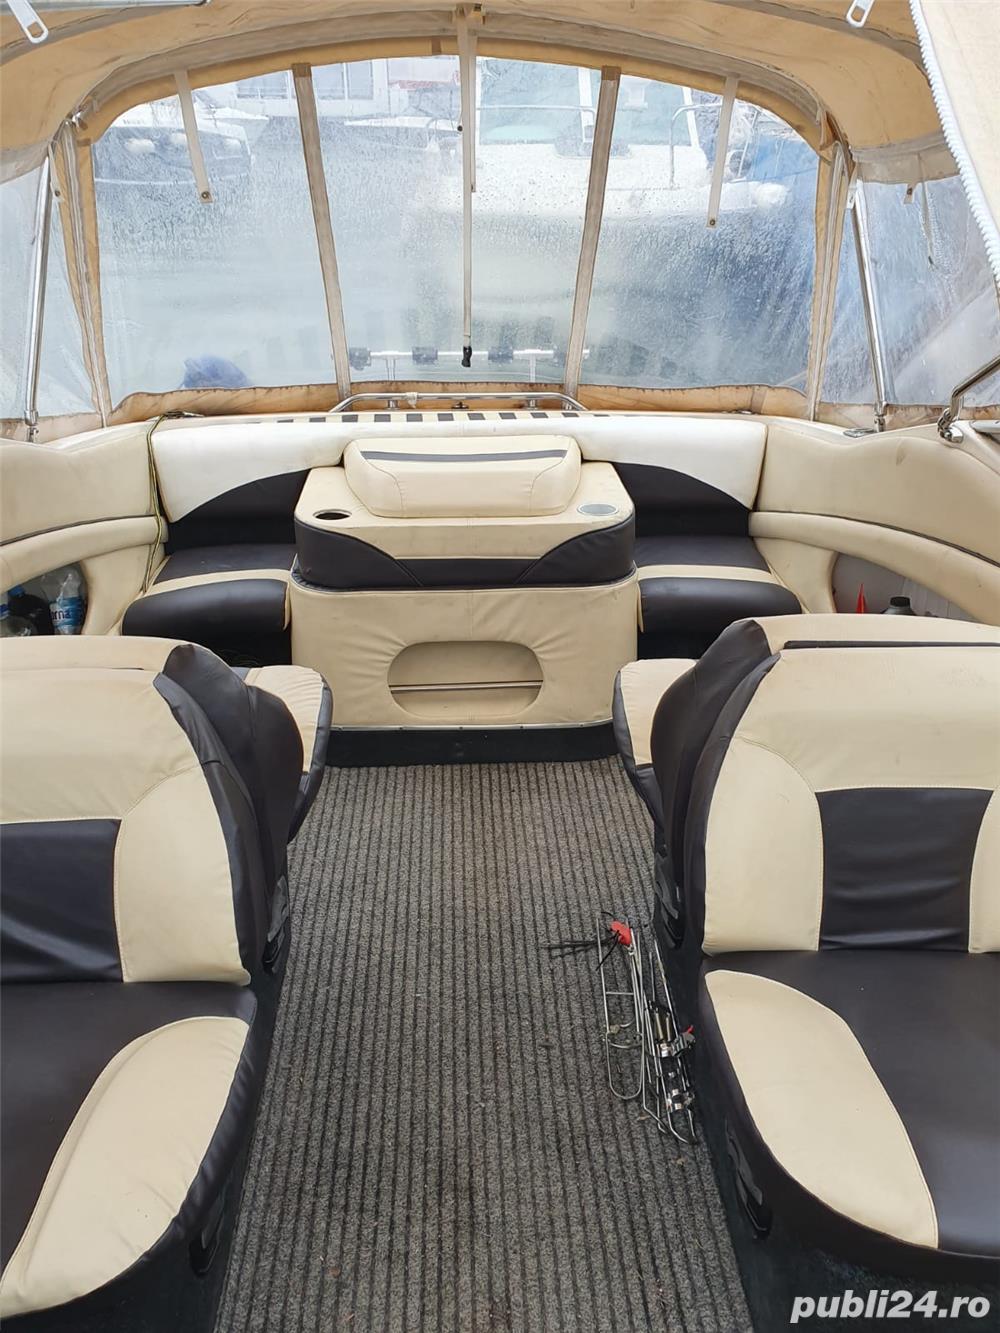 Barca Bayliner cu motor Volvo 200 cai inboard